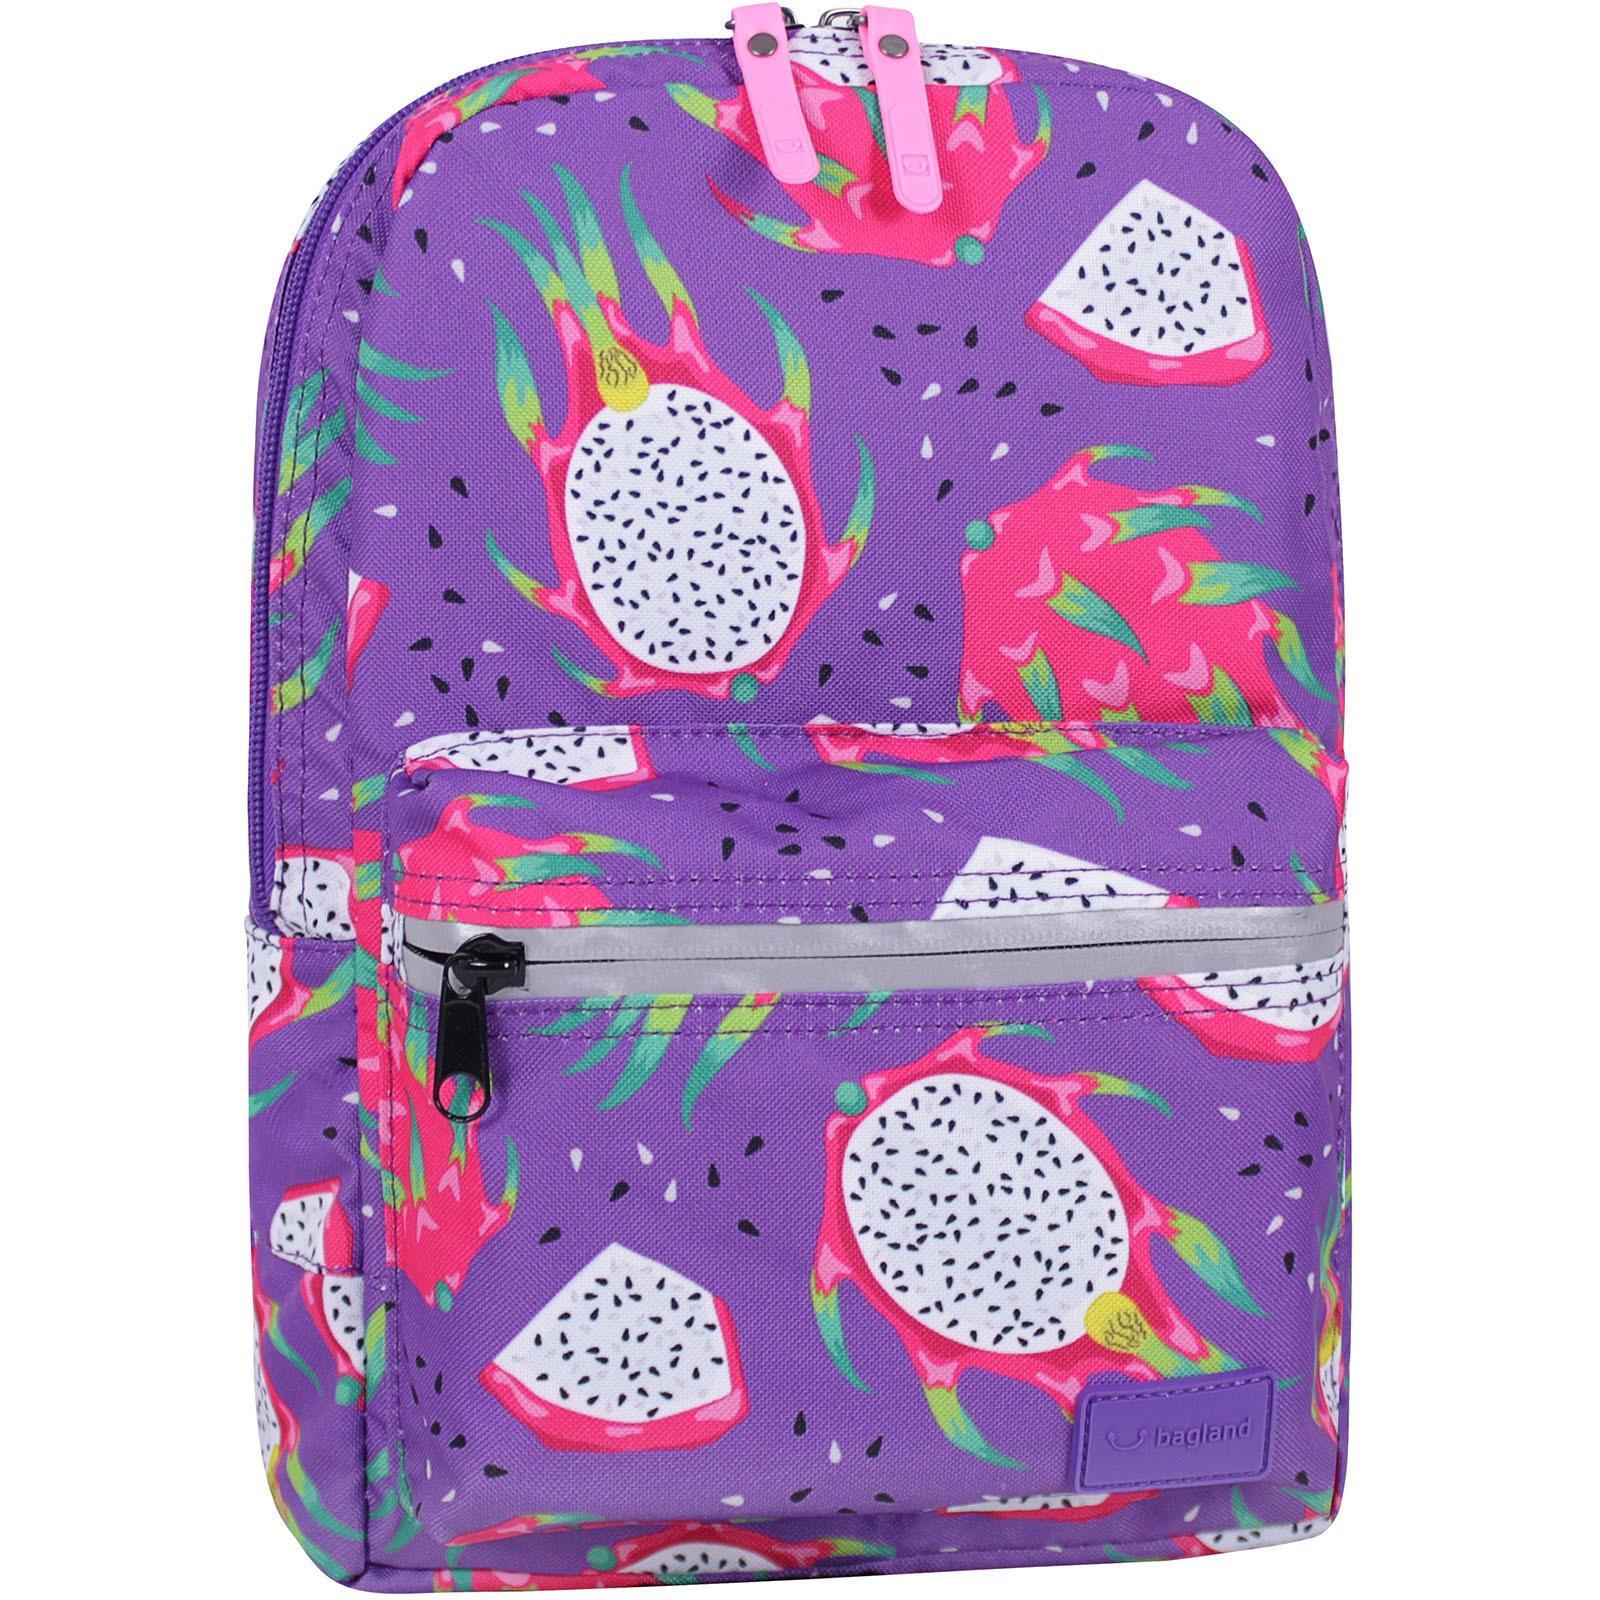 Молодежные рюкзаки Рюкзак Bagland Молодежный mini 8 л. сублимация 759 (00508664) IMG_1844суб.759.JPG